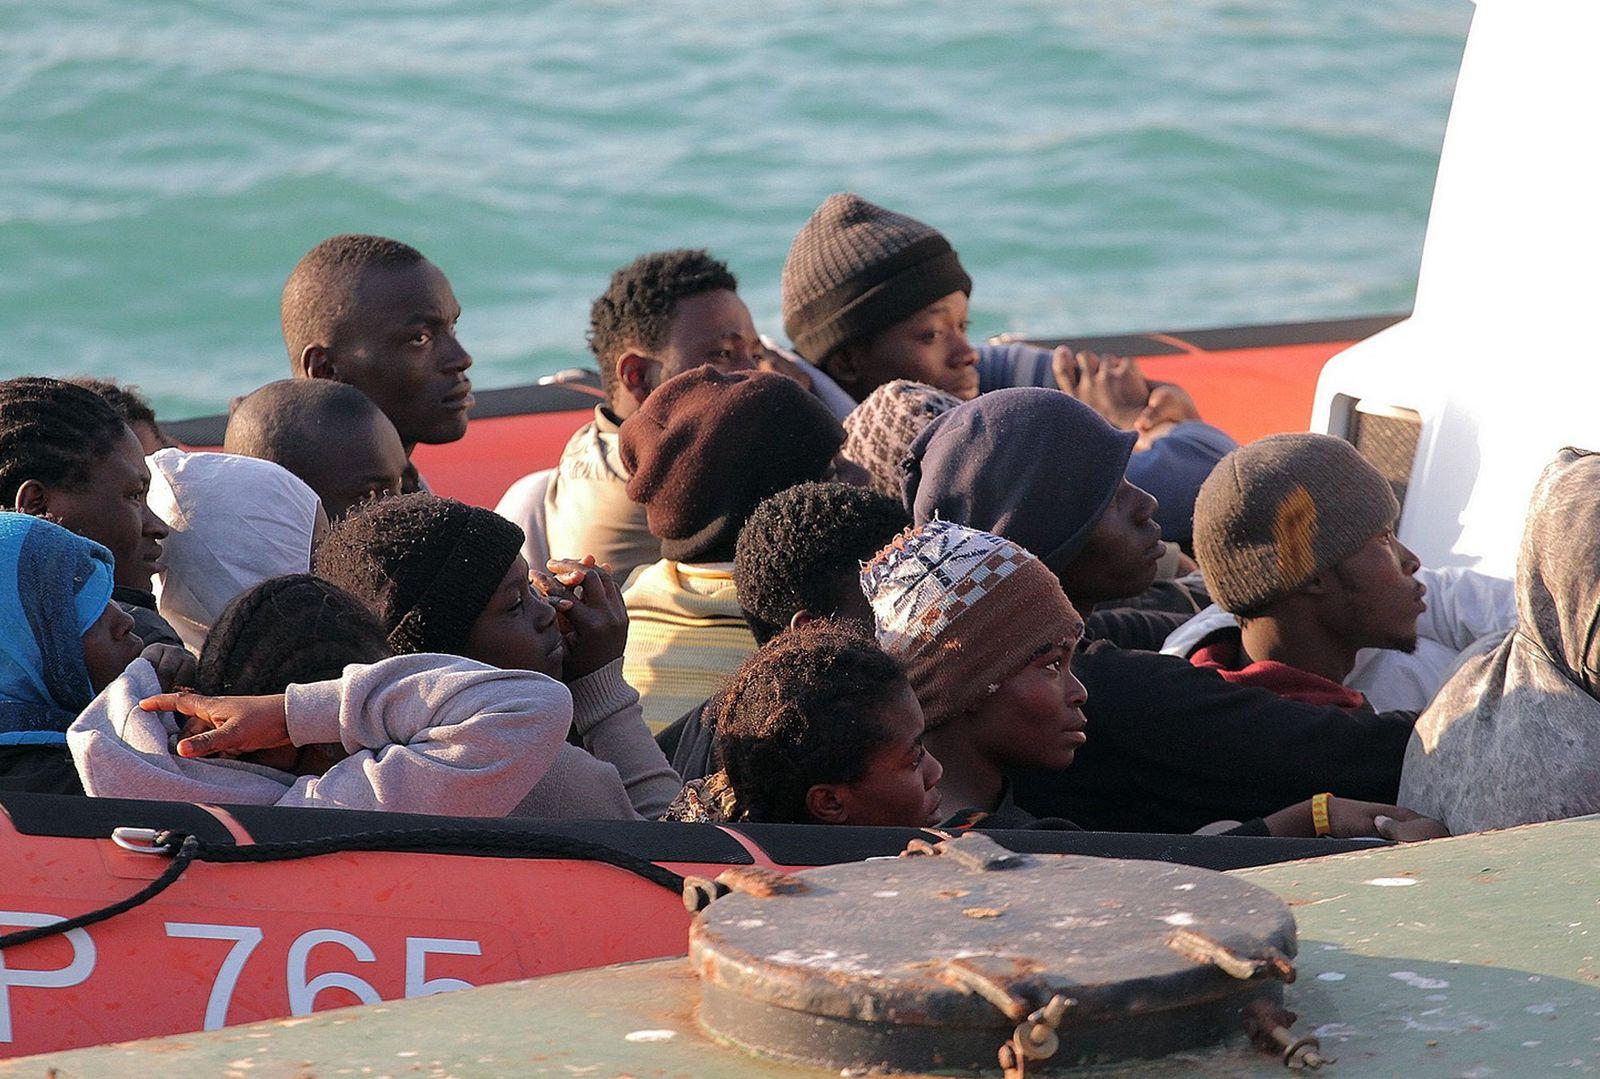 Flüchtlinge vor liberischer Küste gesunken,